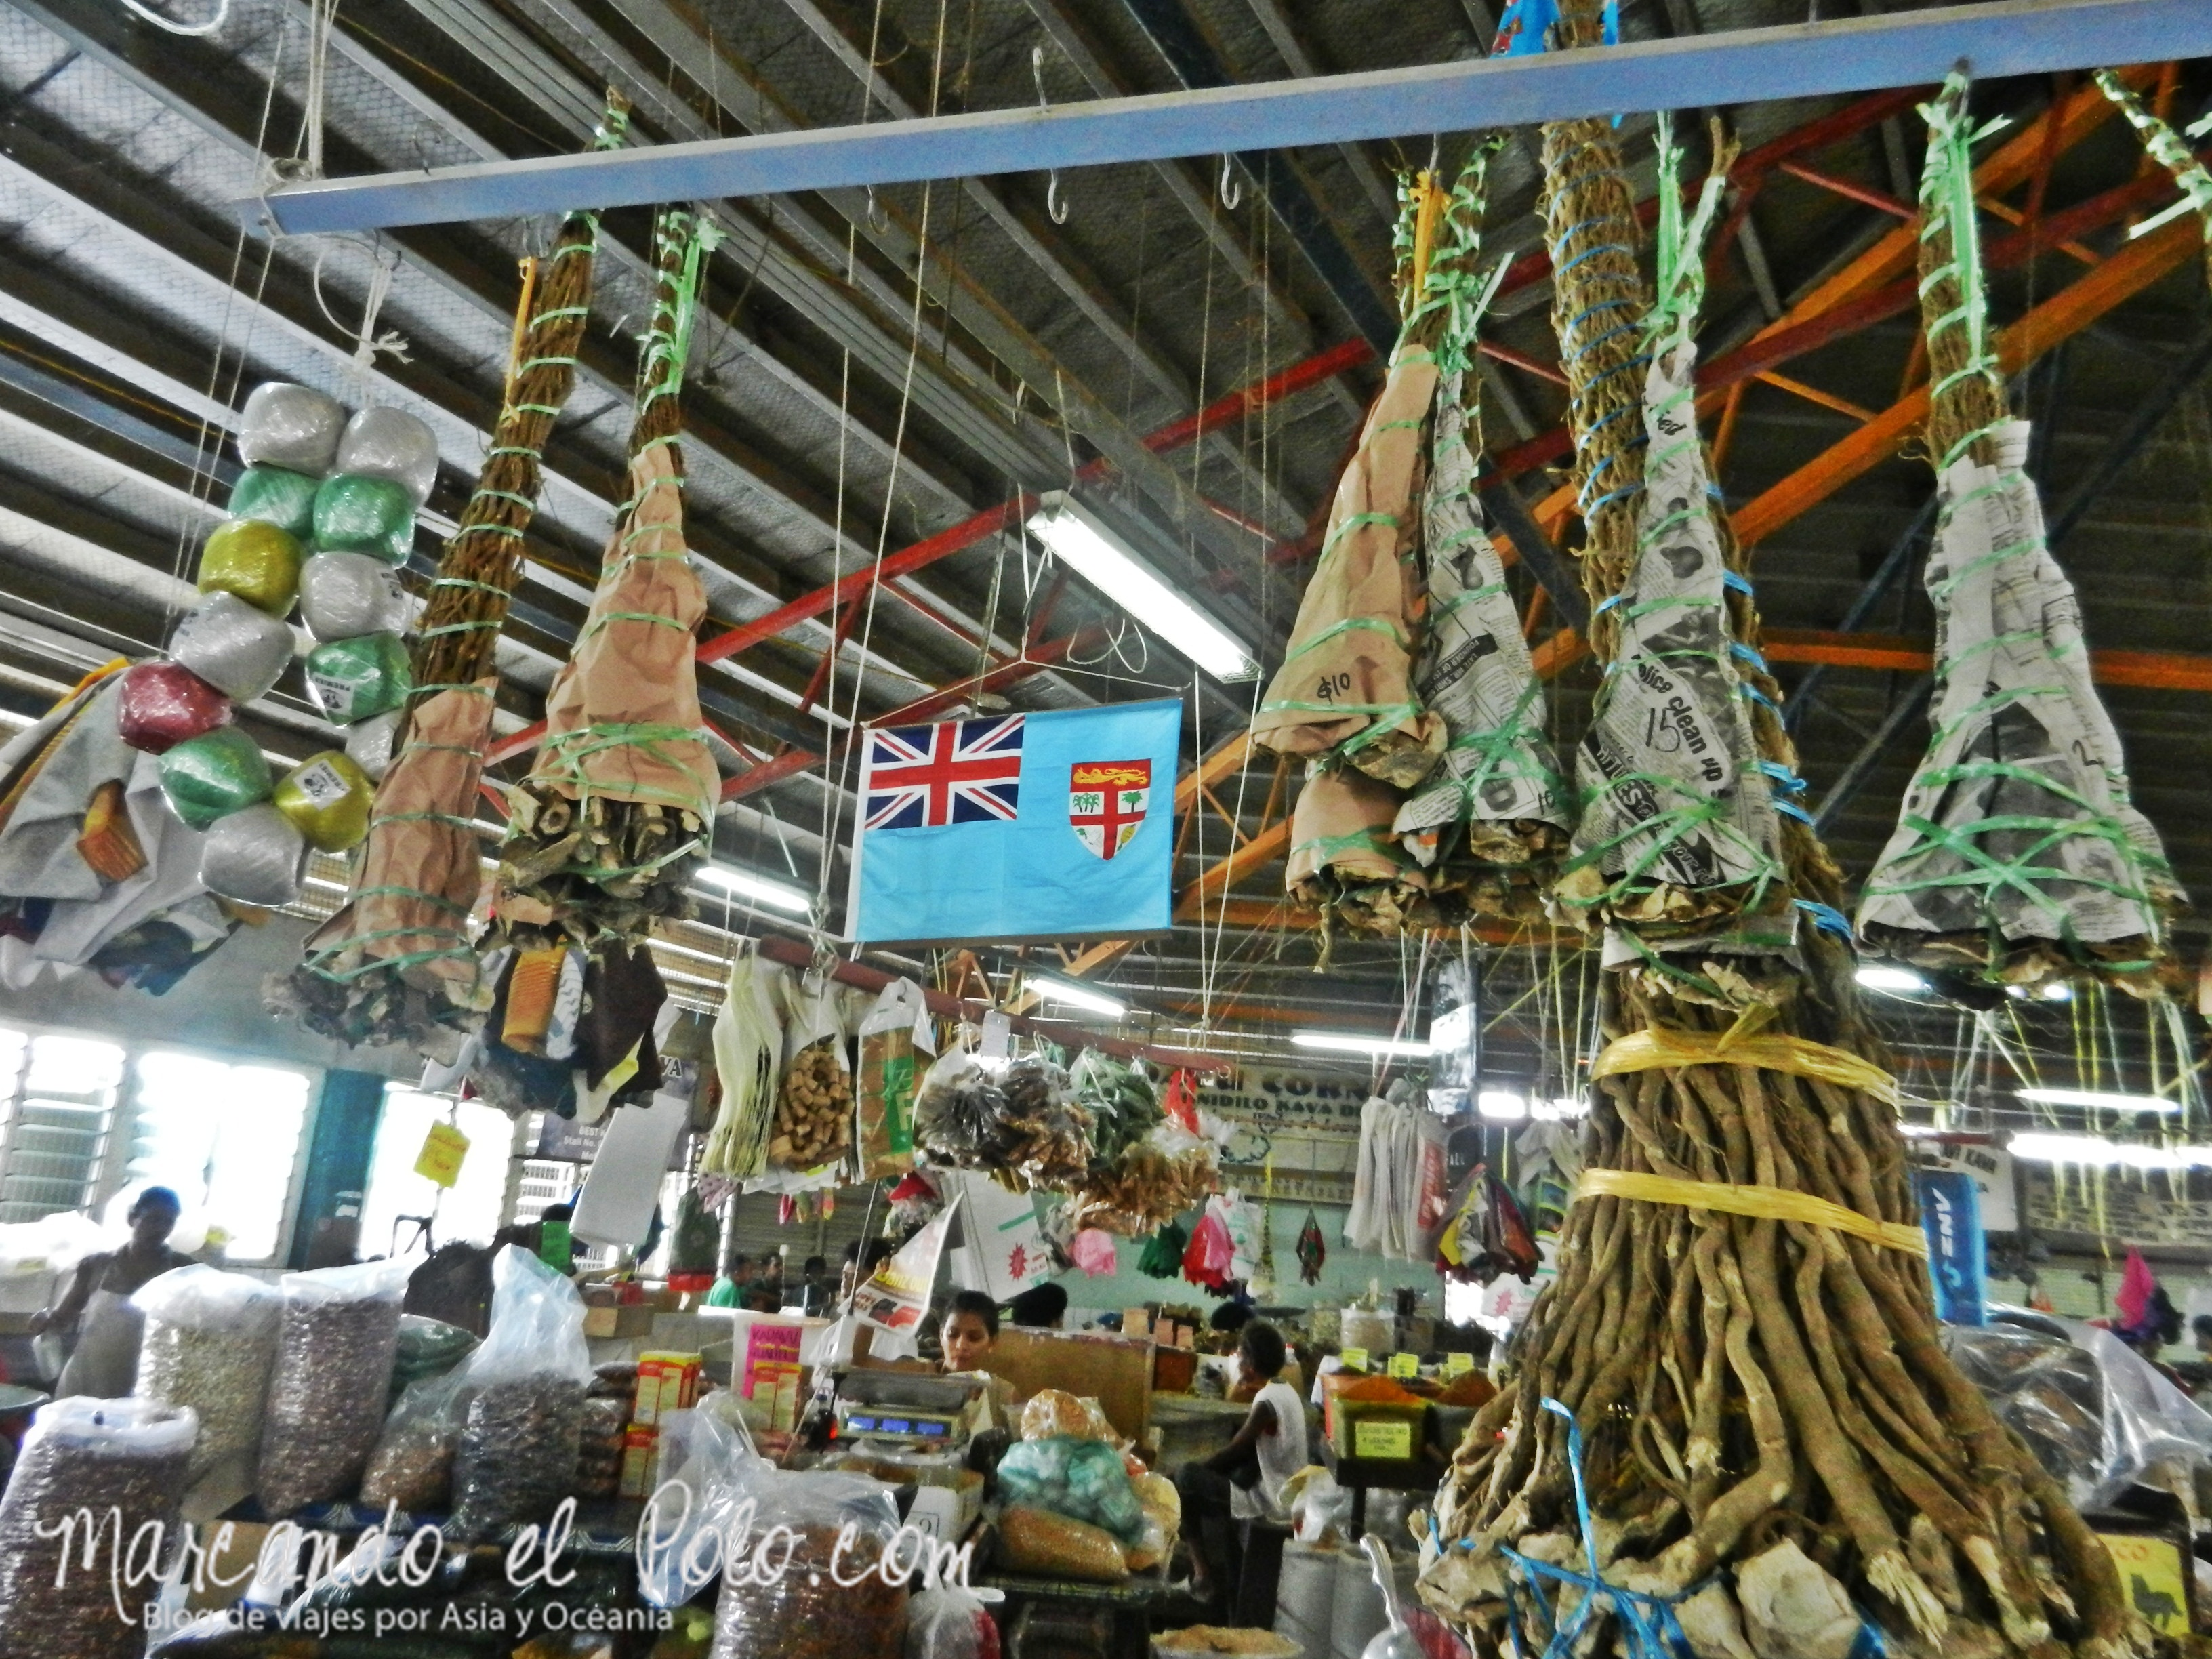 Kava en Fiyi: Pirámides de raíces de kava en el mercado de Suva.